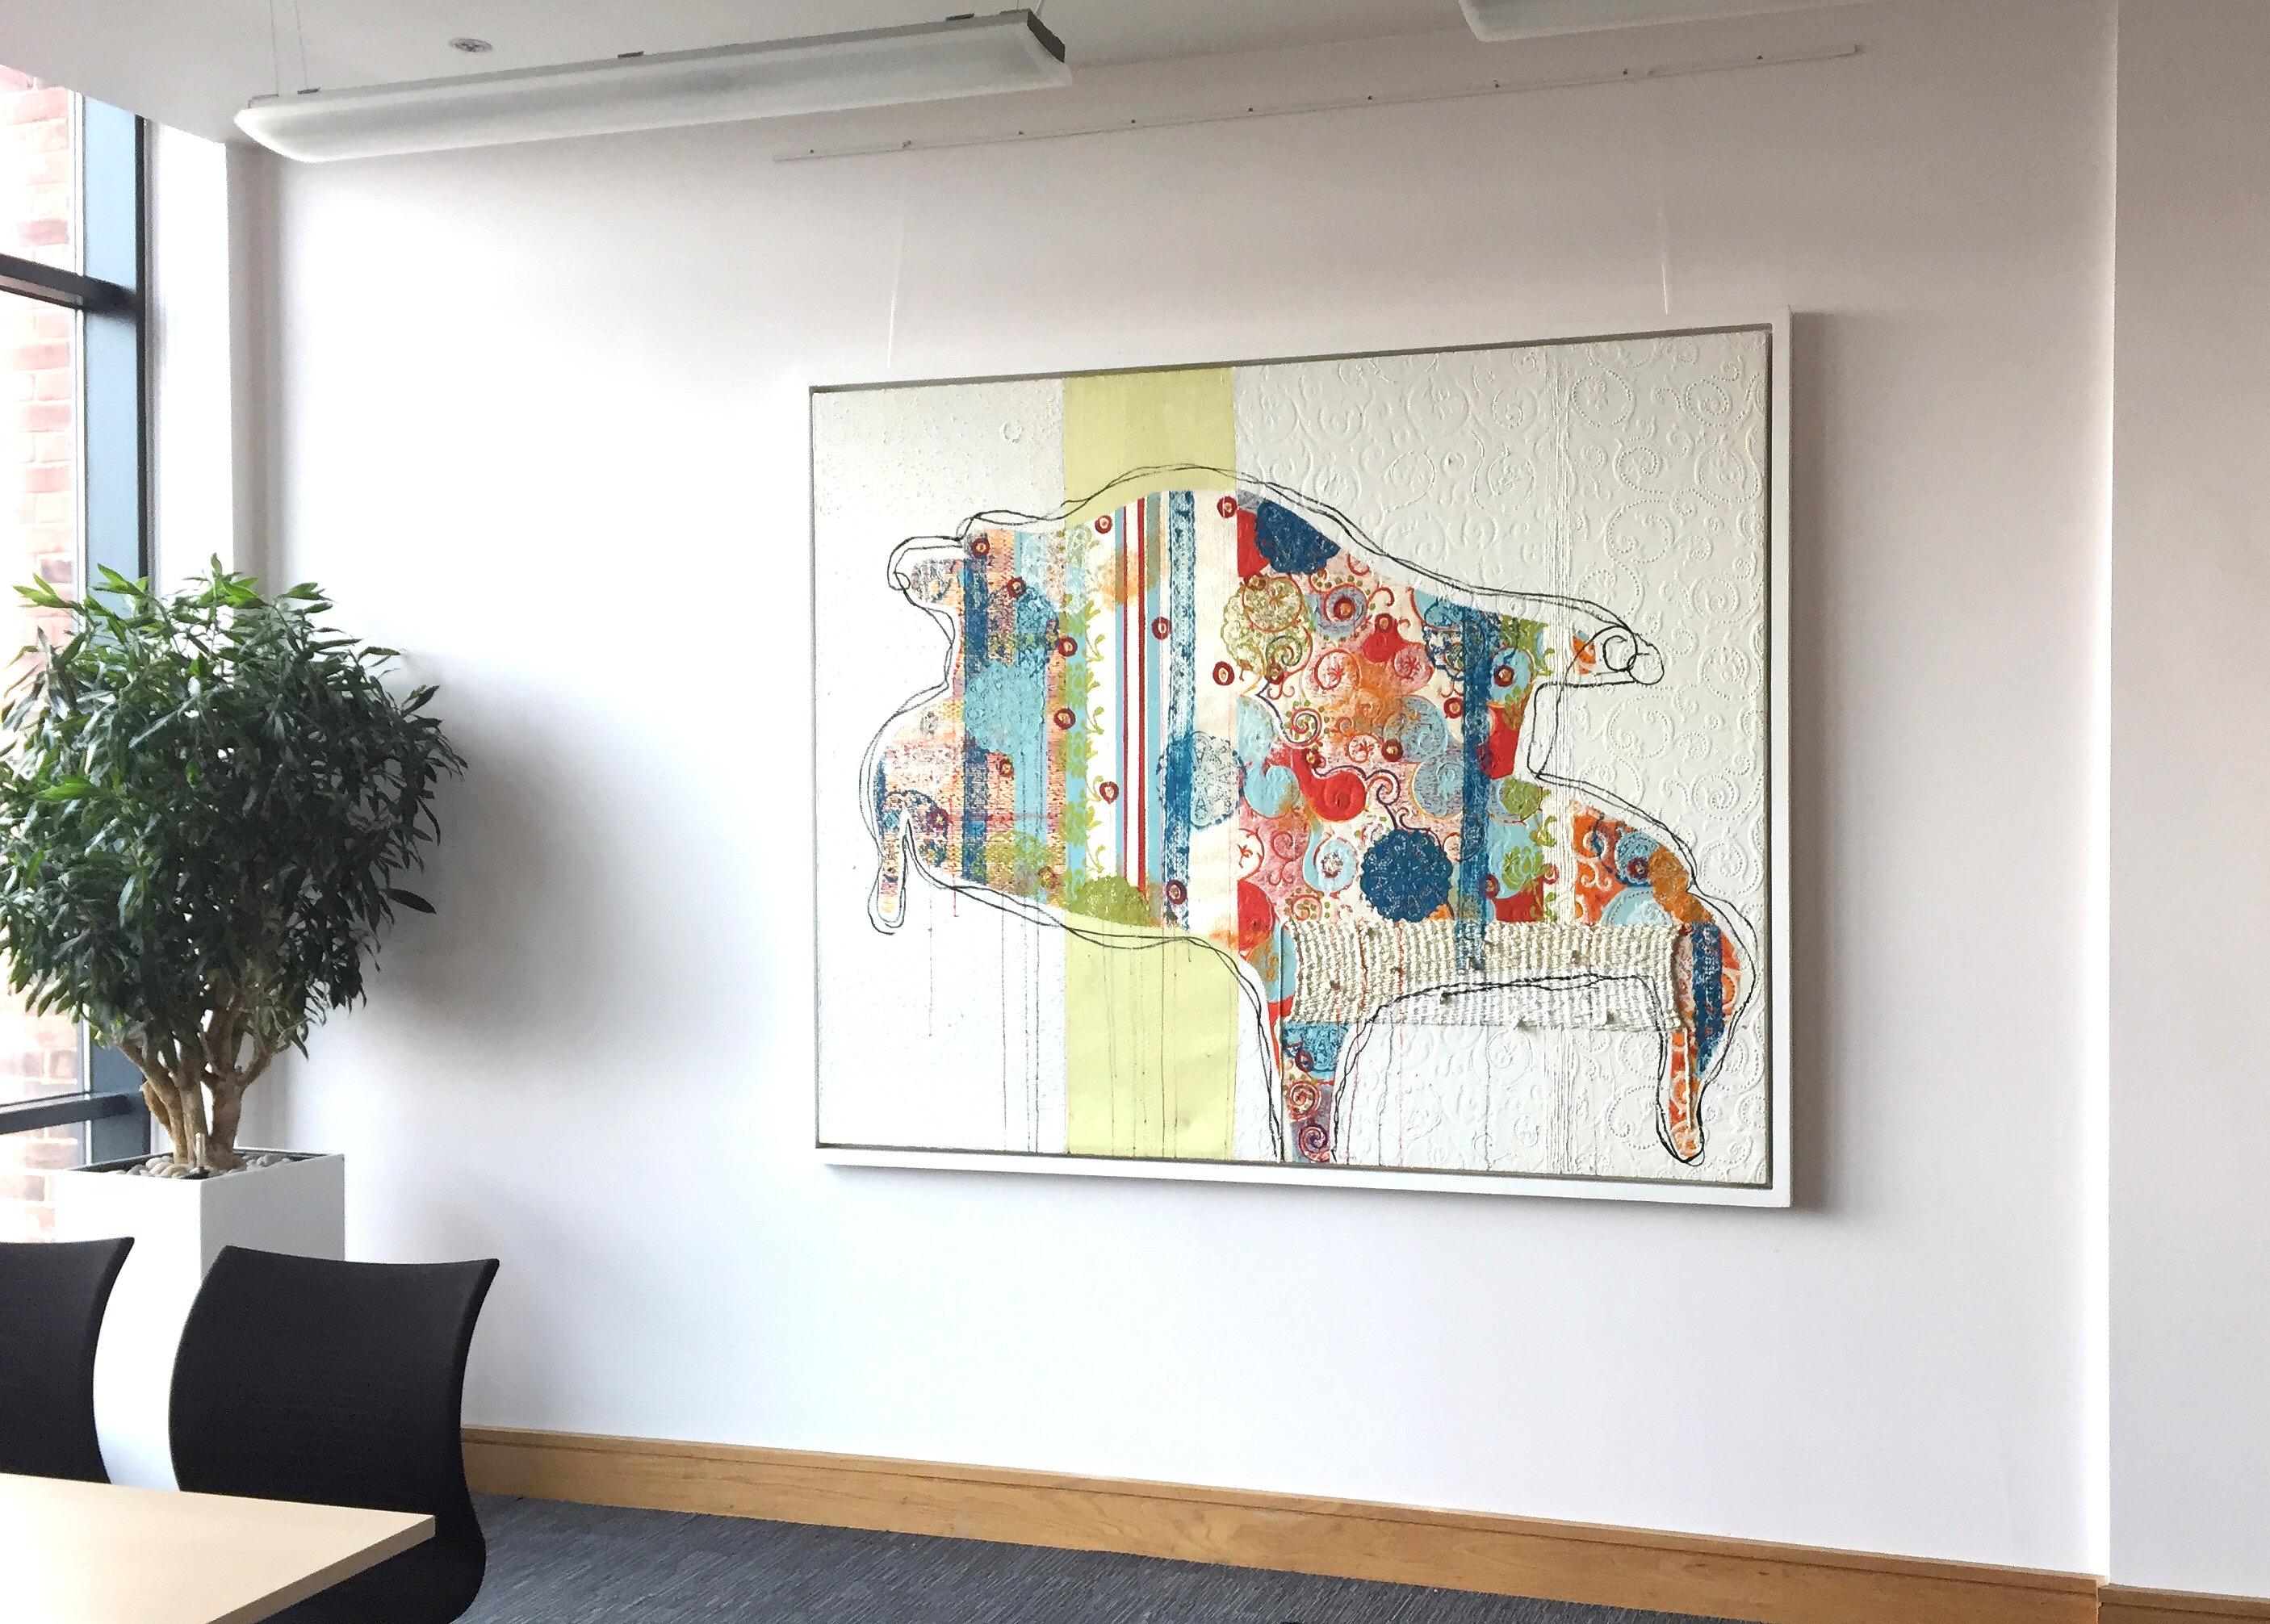 dot-art at The Women's Organisation